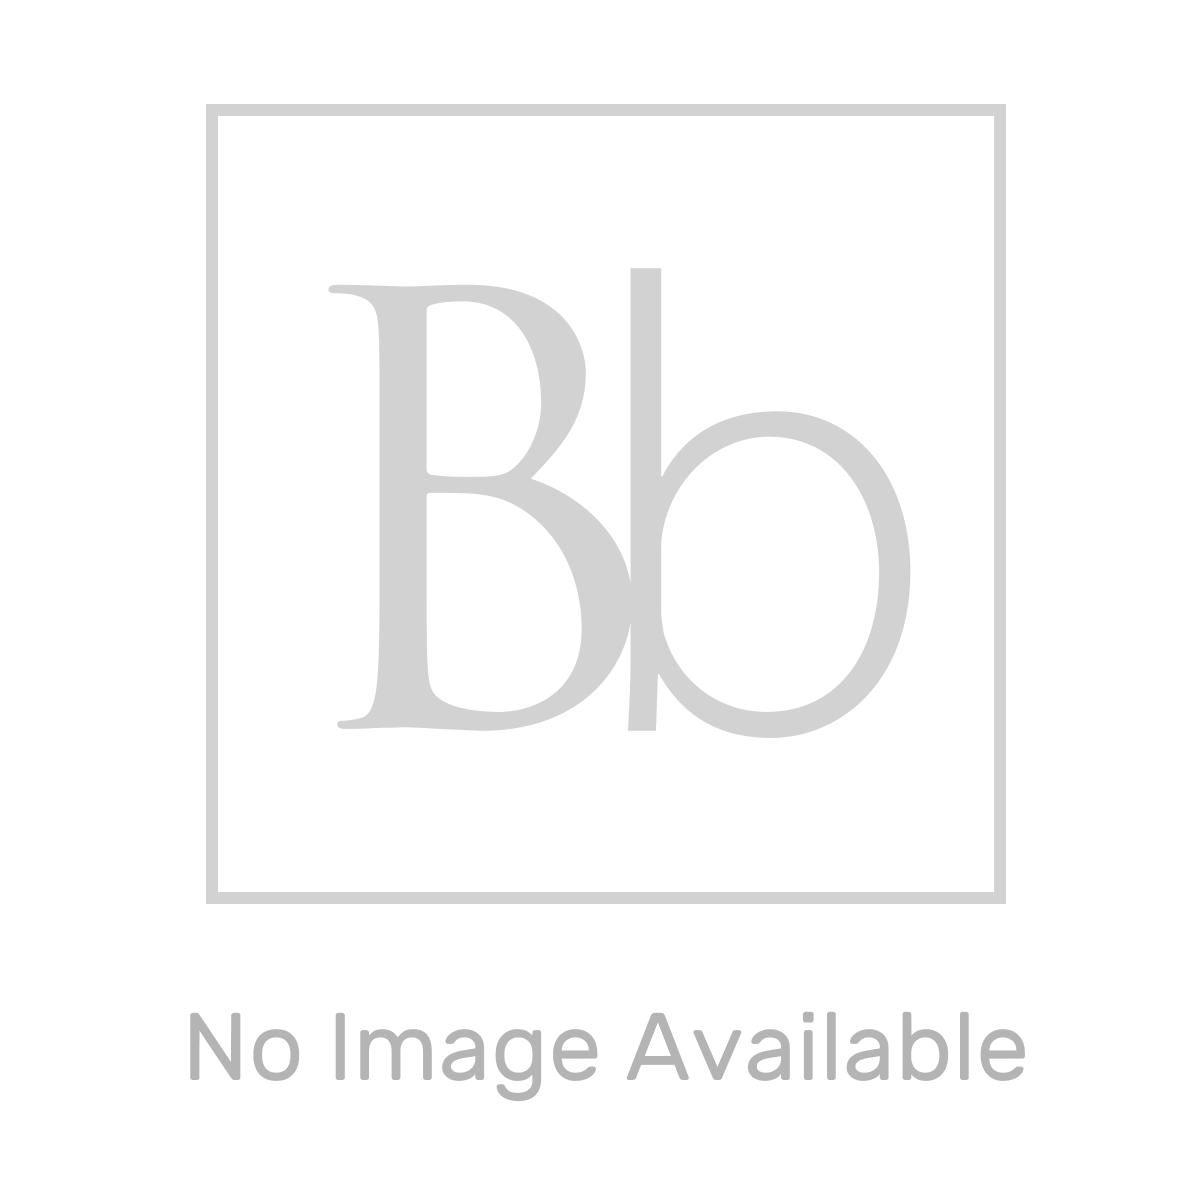 Sena Single Black Electric Horizontal Radiator 550 x 790mm Detail